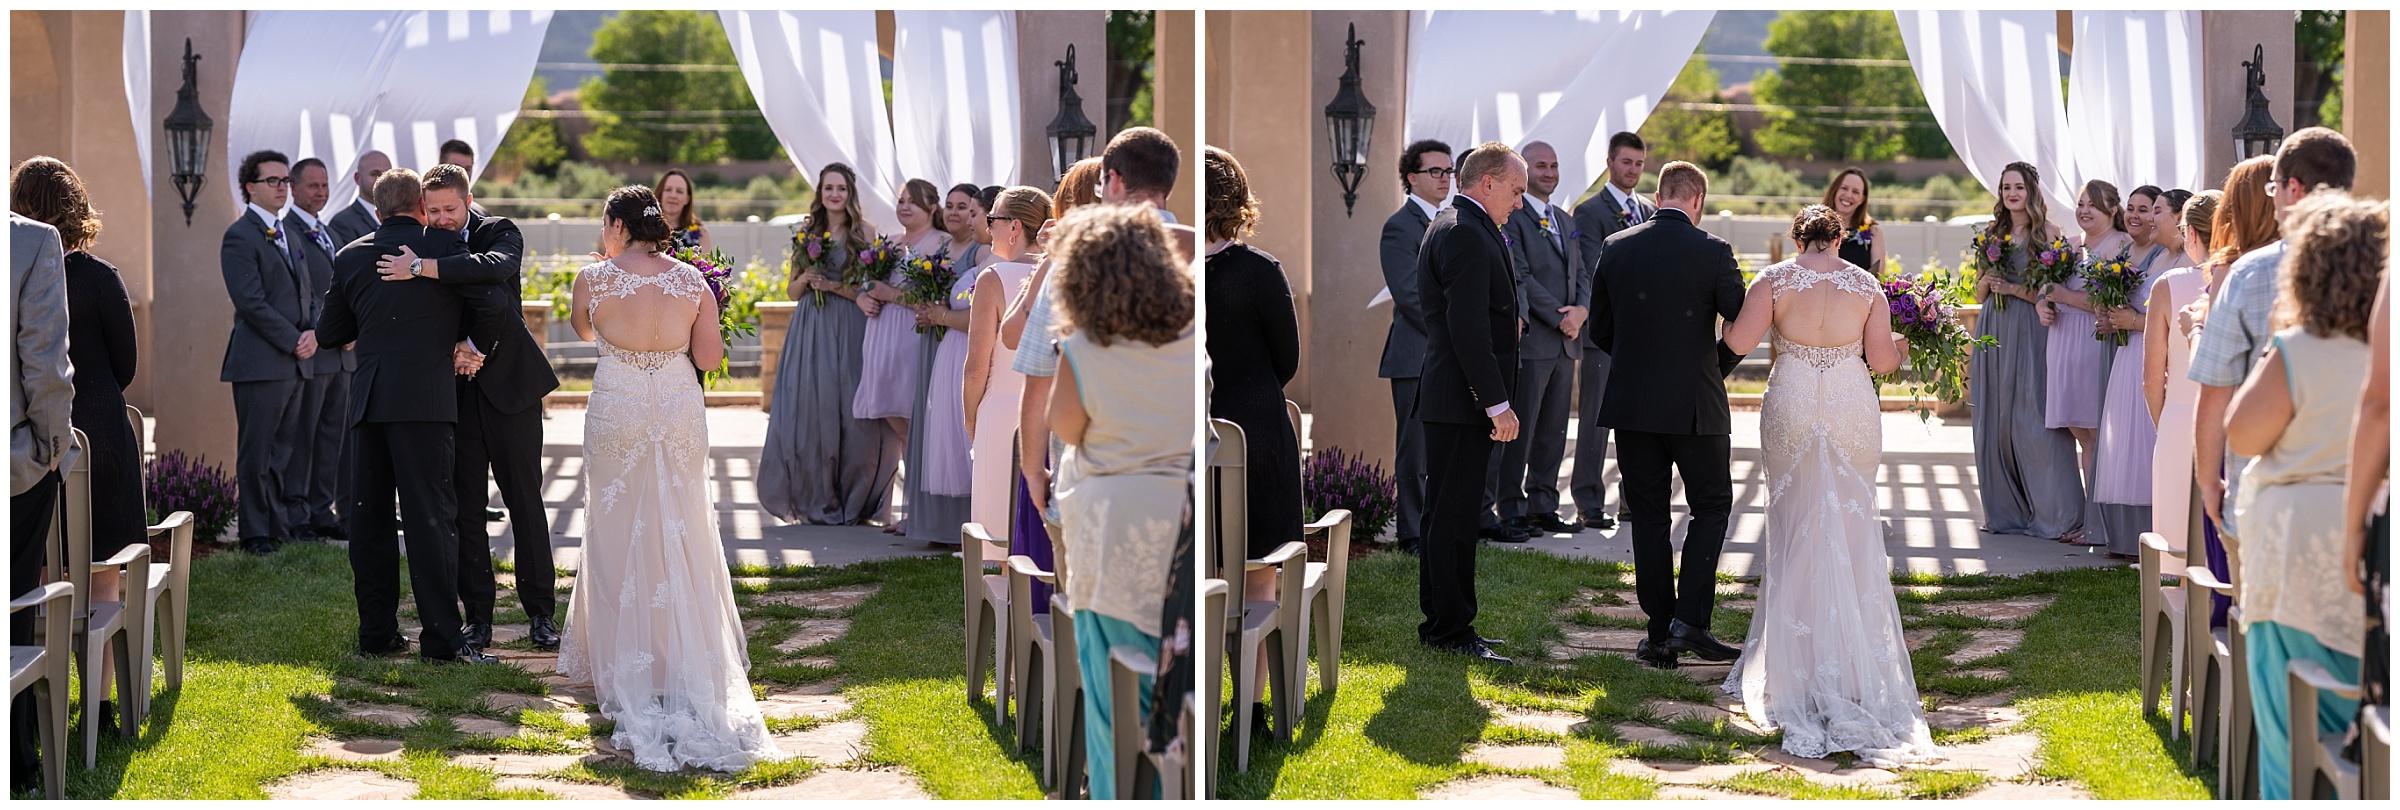 Grand Junction Wedding Photographer 0040.jpg